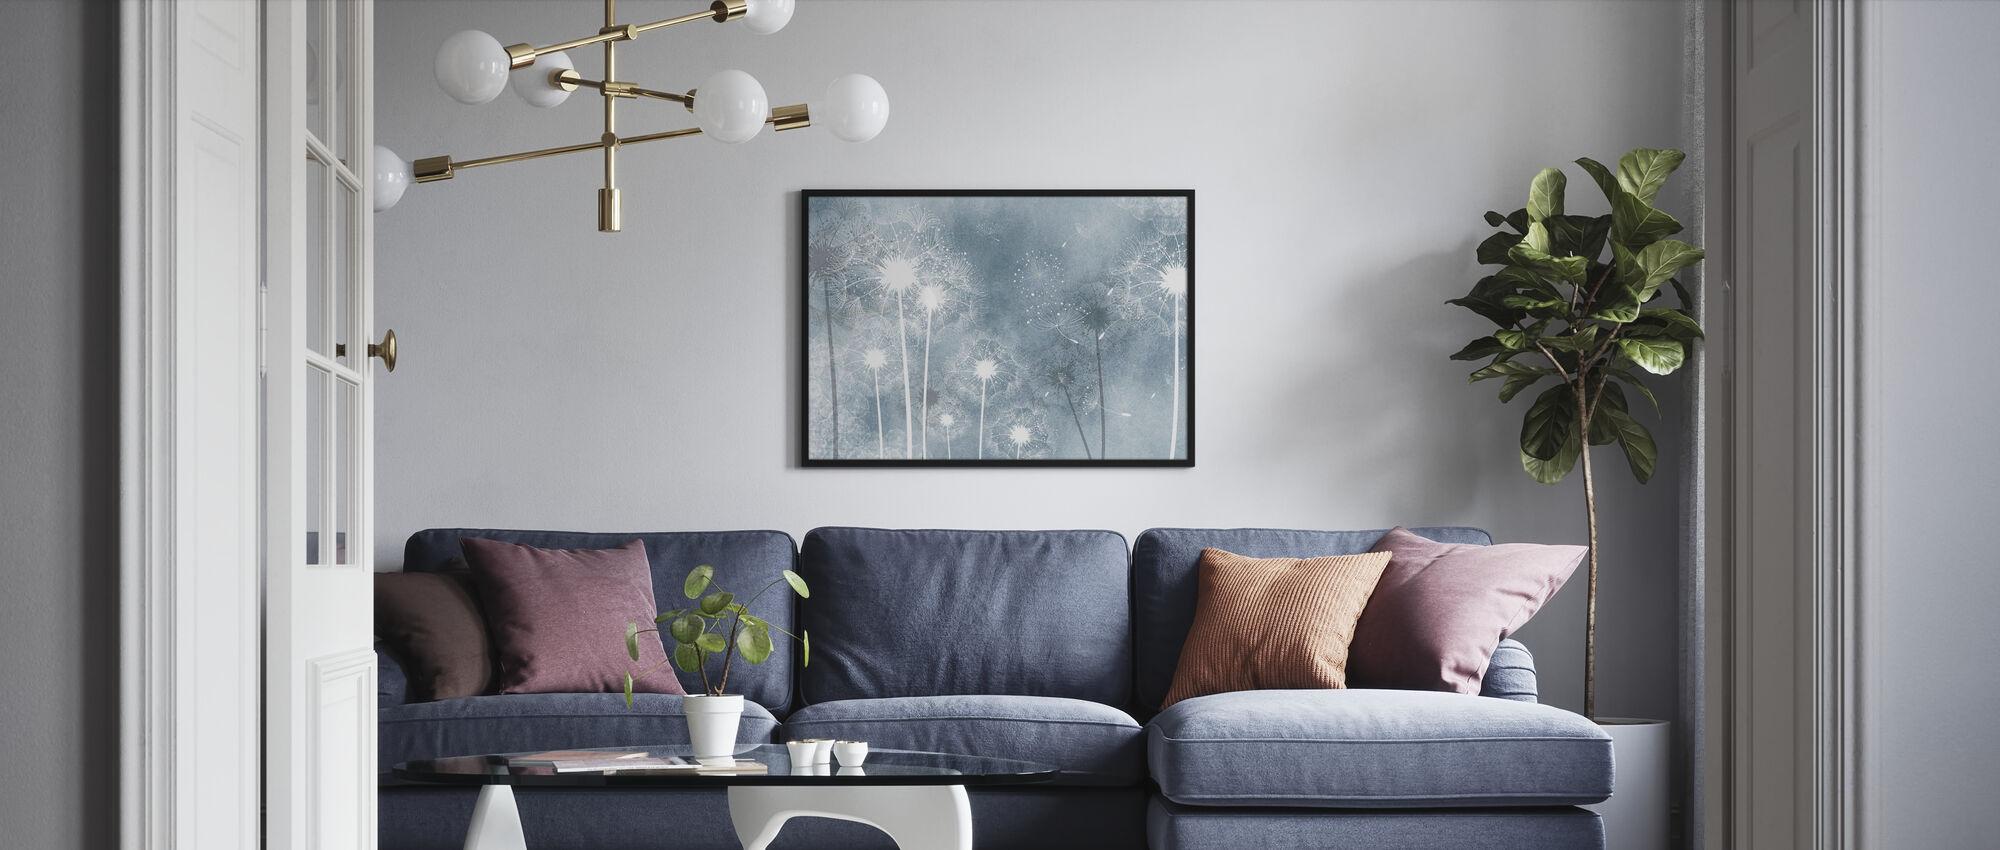 Dandelion Sky - Poster - Living Room